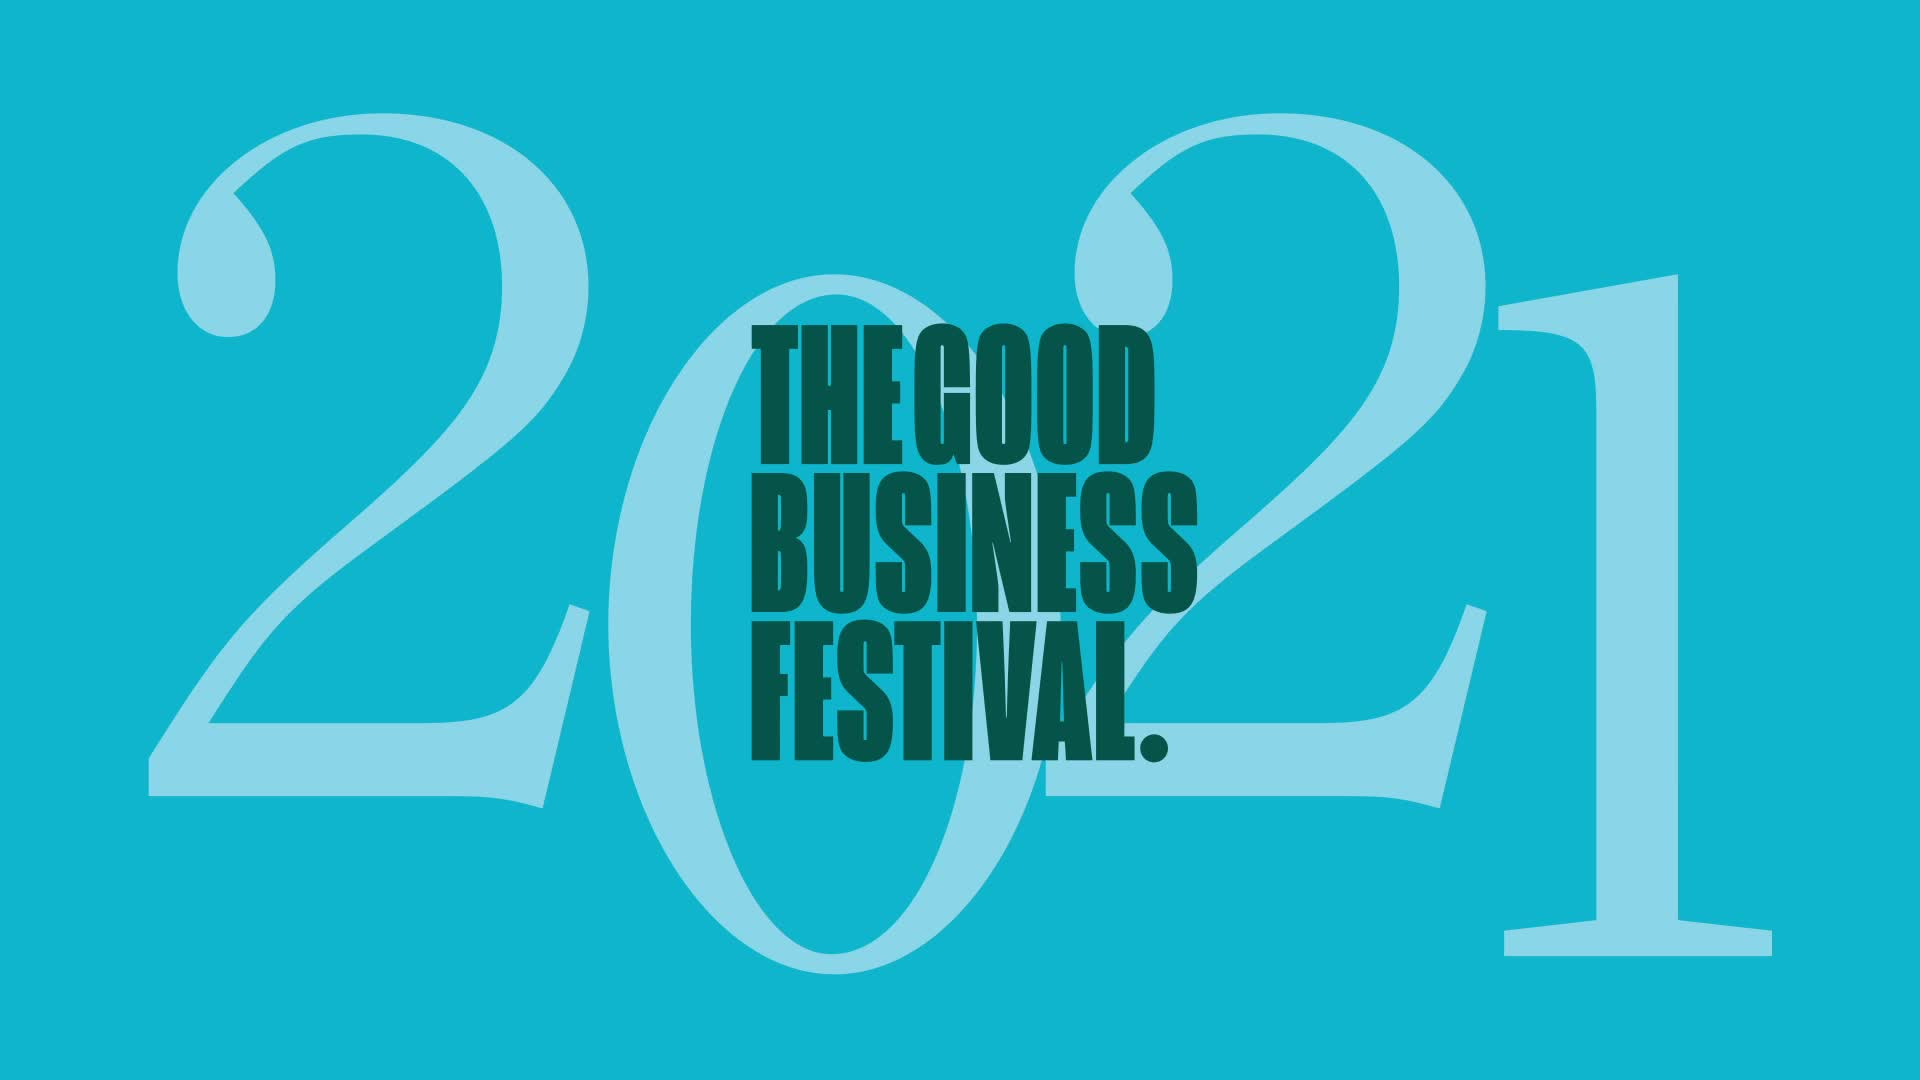 The Good Business Festival 2021 logo